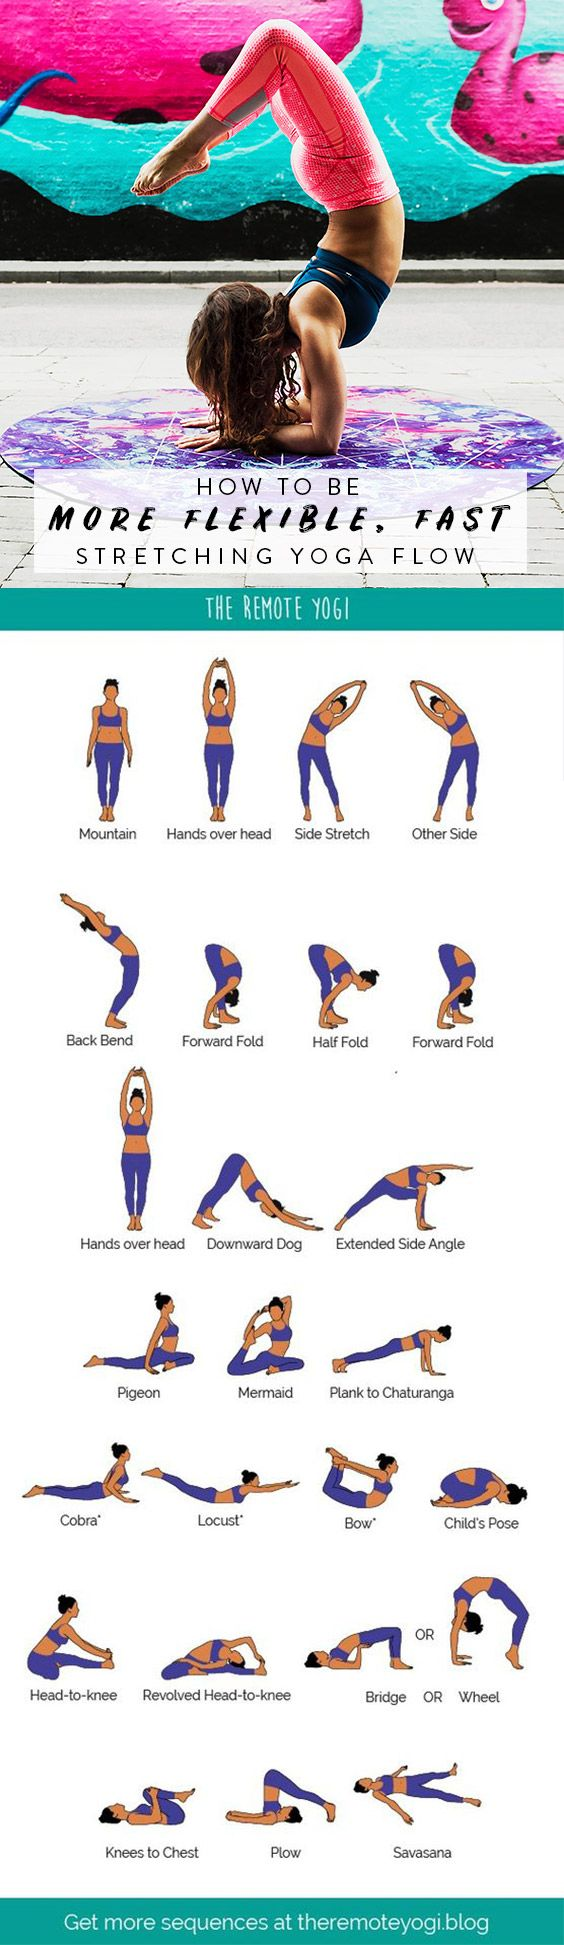 Yoga Flow for a Bendy Spine – FREE PDF